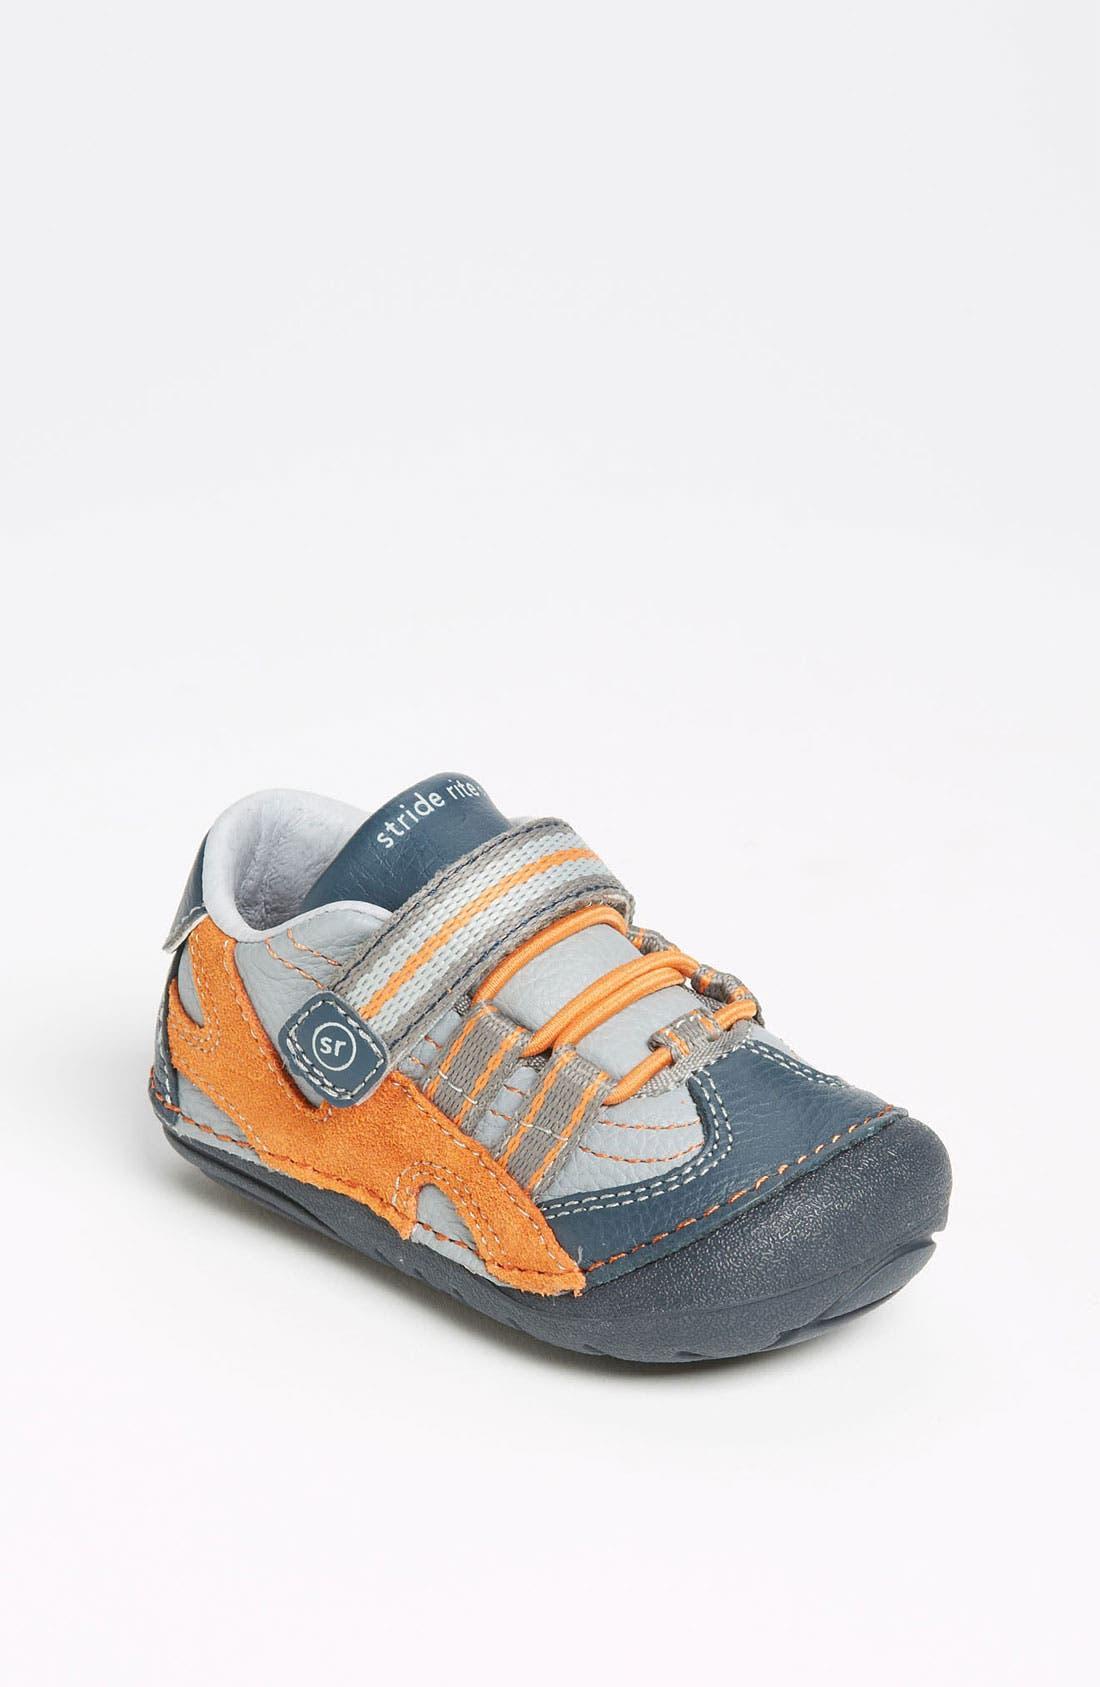 Alternate Image 1 Selected - Stride Rite 'Leo' Sneaker (Baby & Walker)